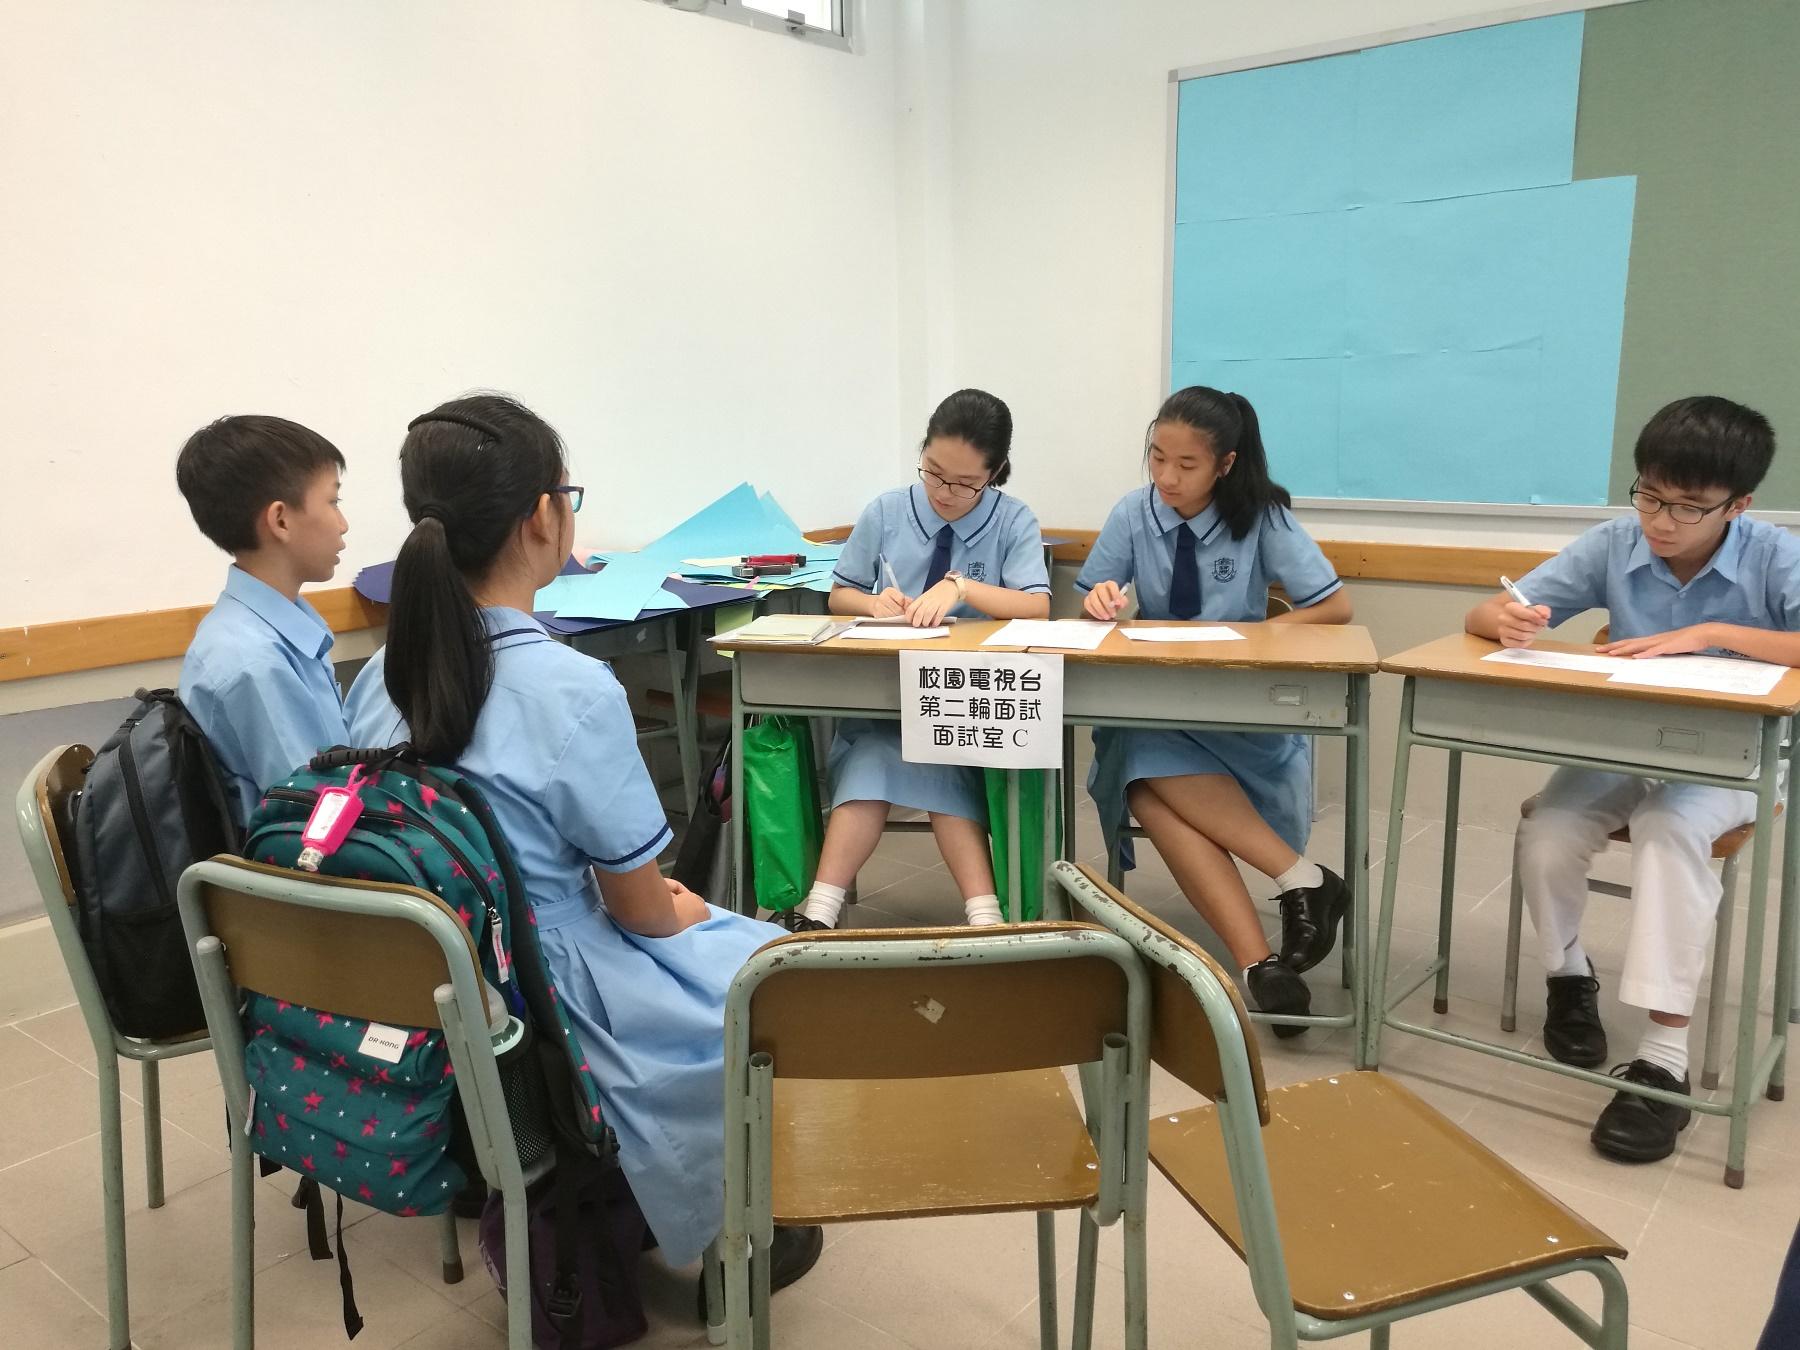 http://www.npc.edu.hk/sites/default/files/img_20170920_163204.jpg